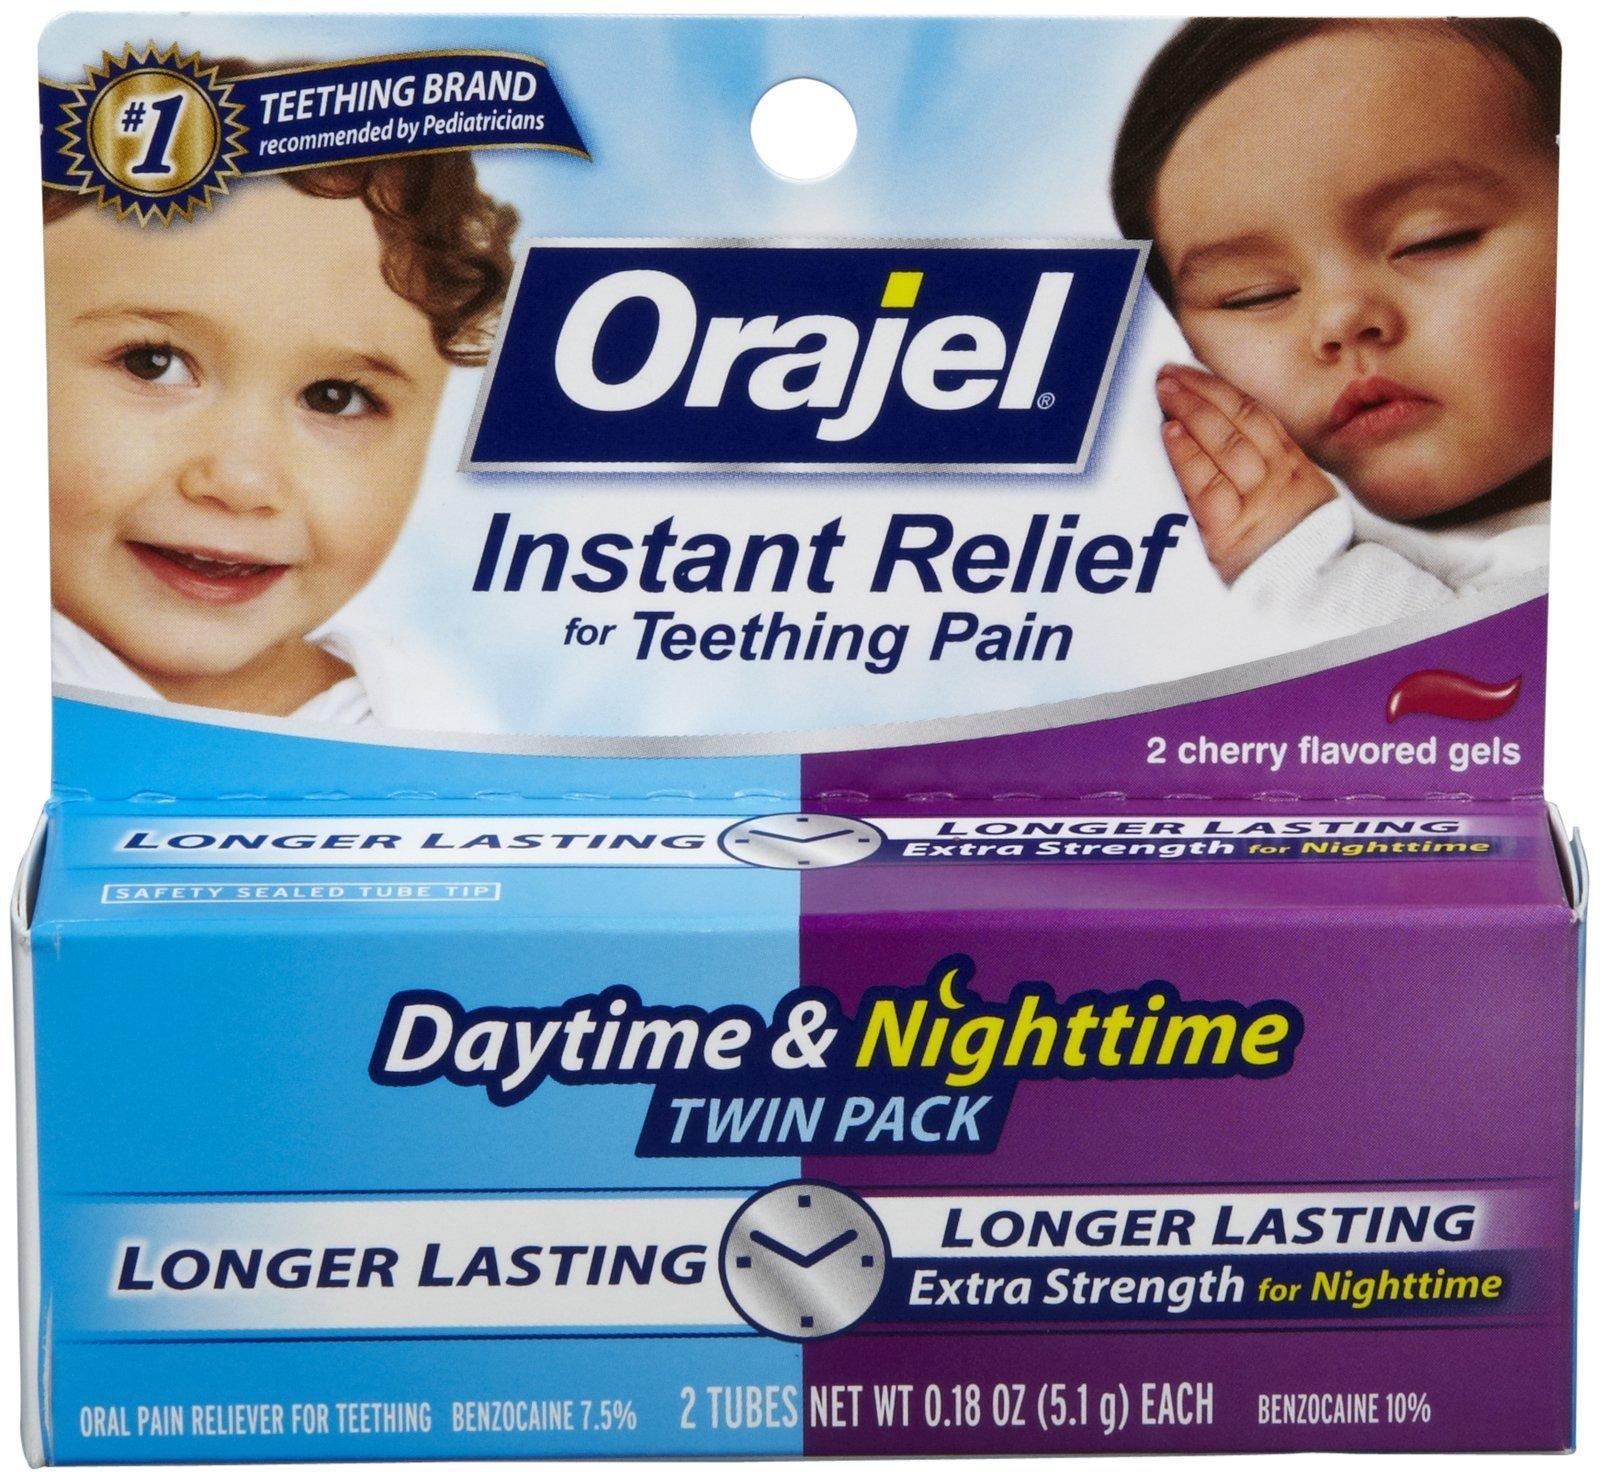 Orajel Oral Pain Reliever - Day/Night 2 Pk